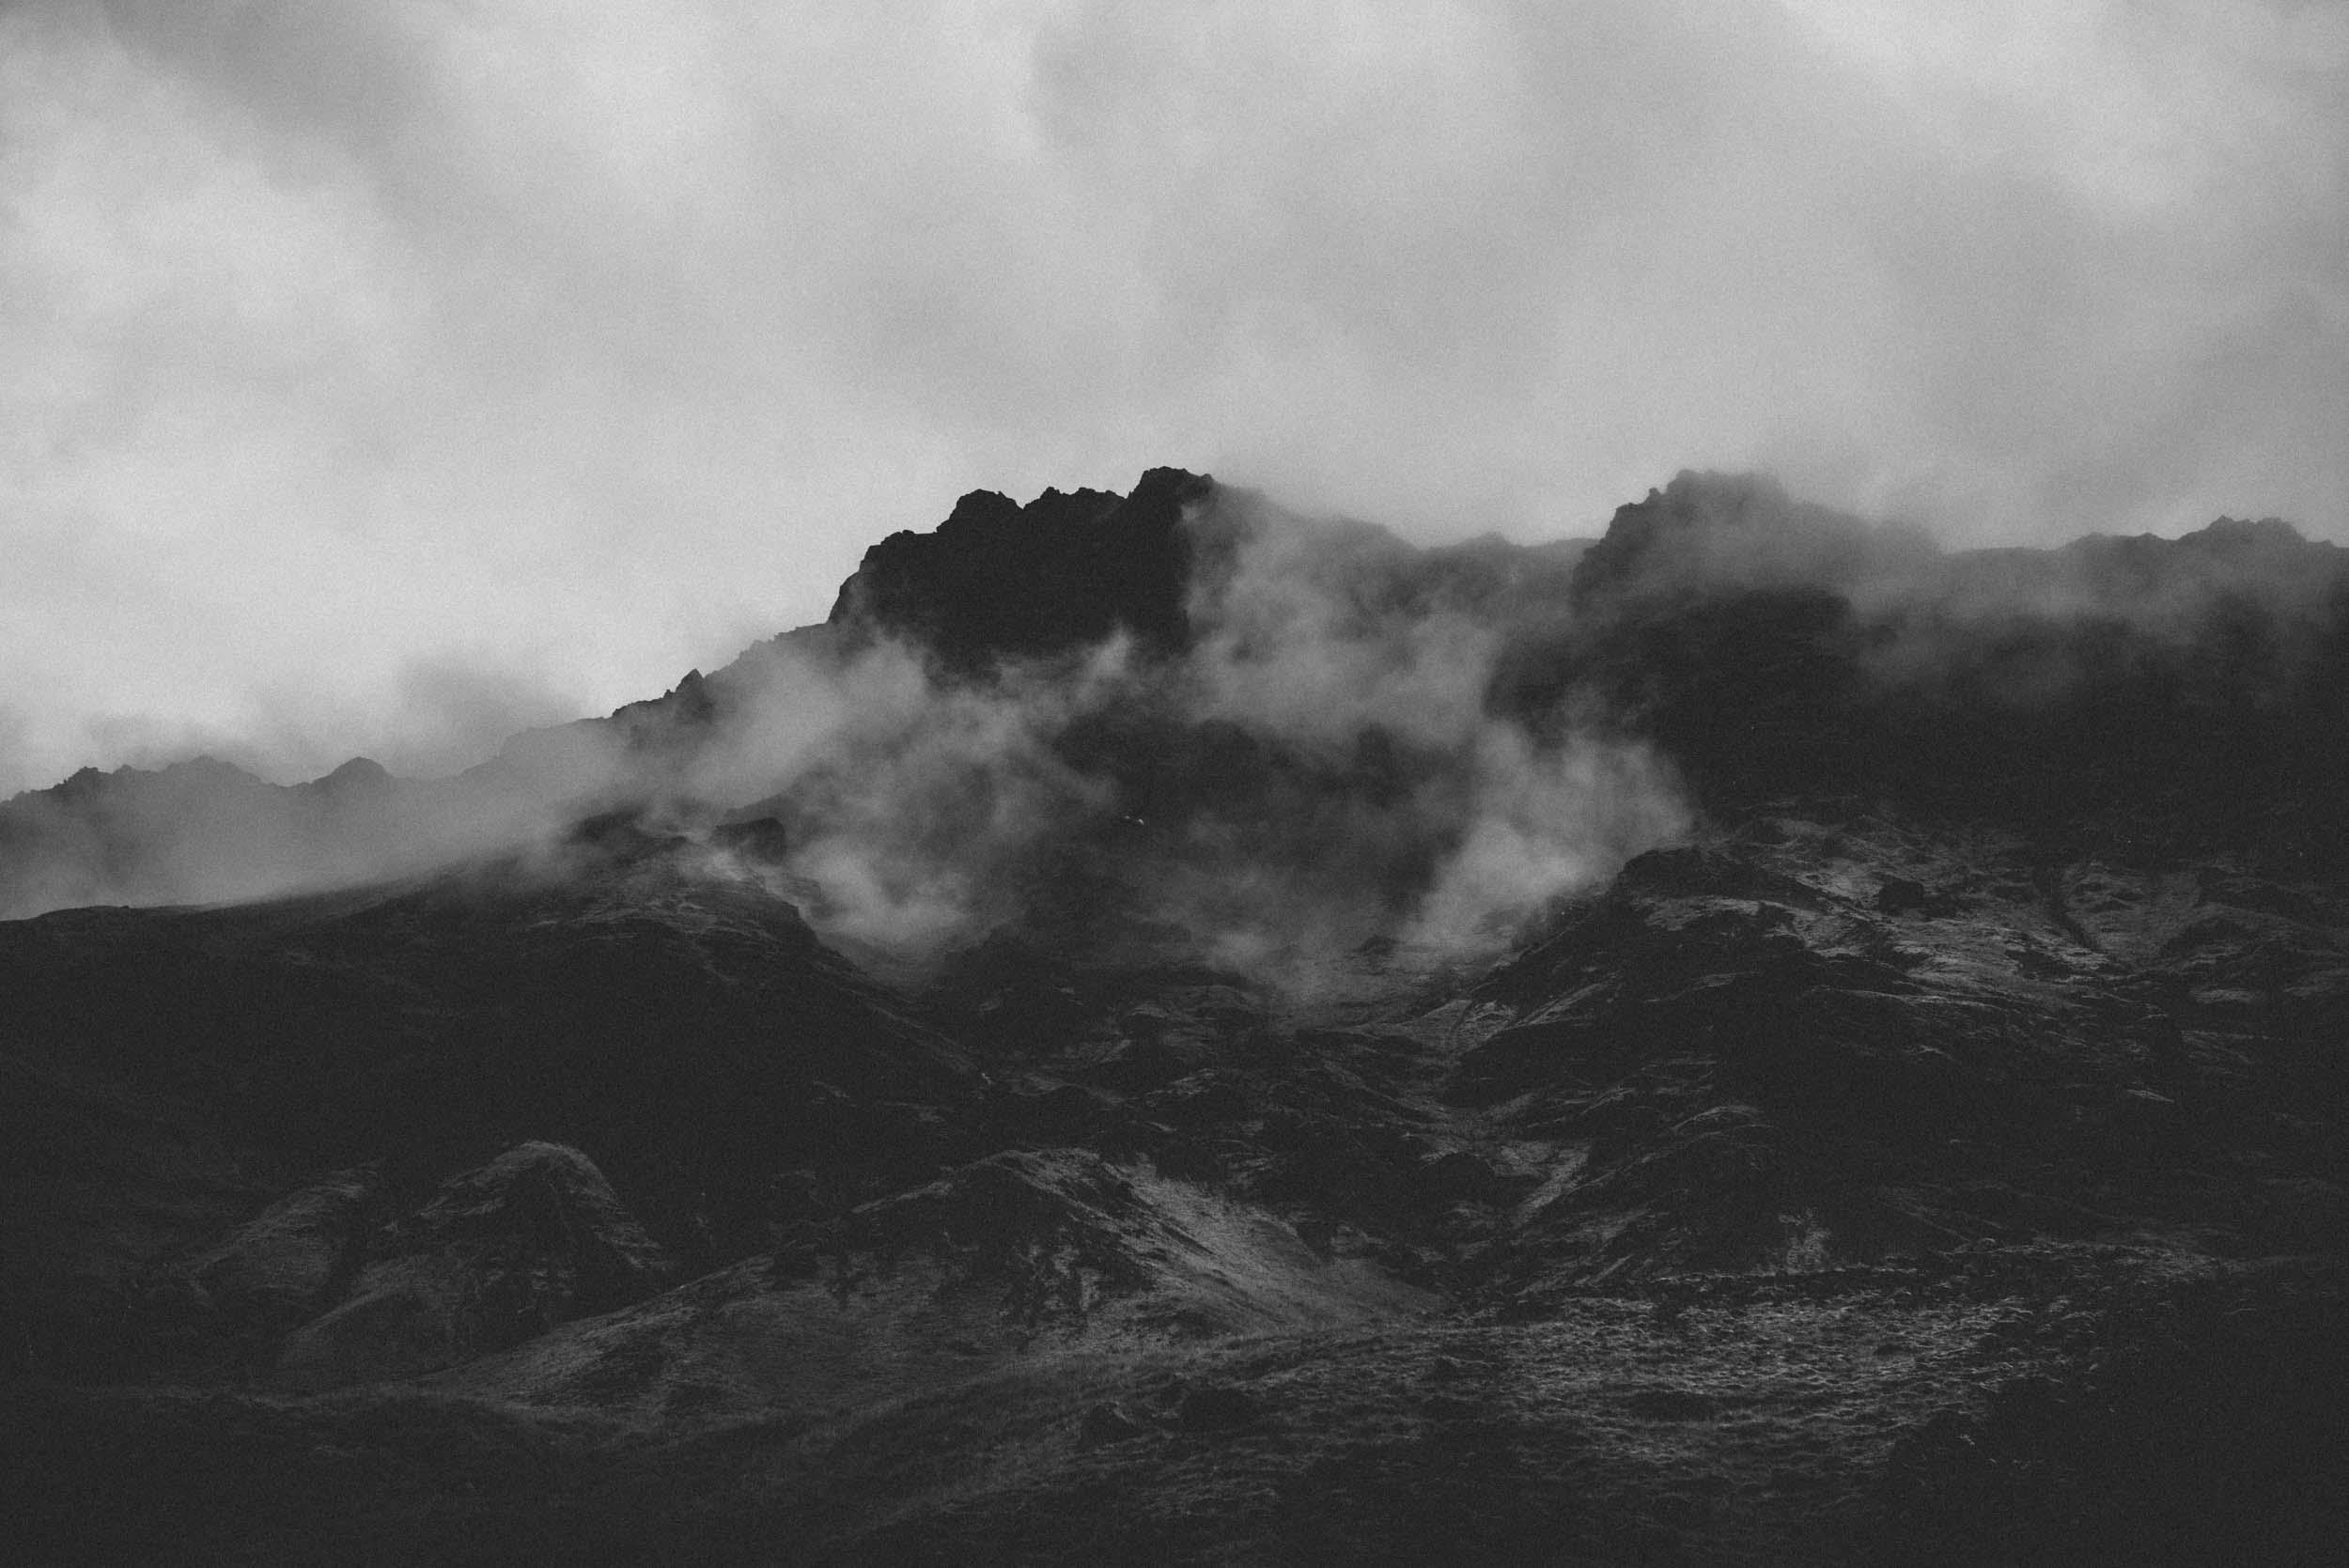 scouting-iceland-37.jpg